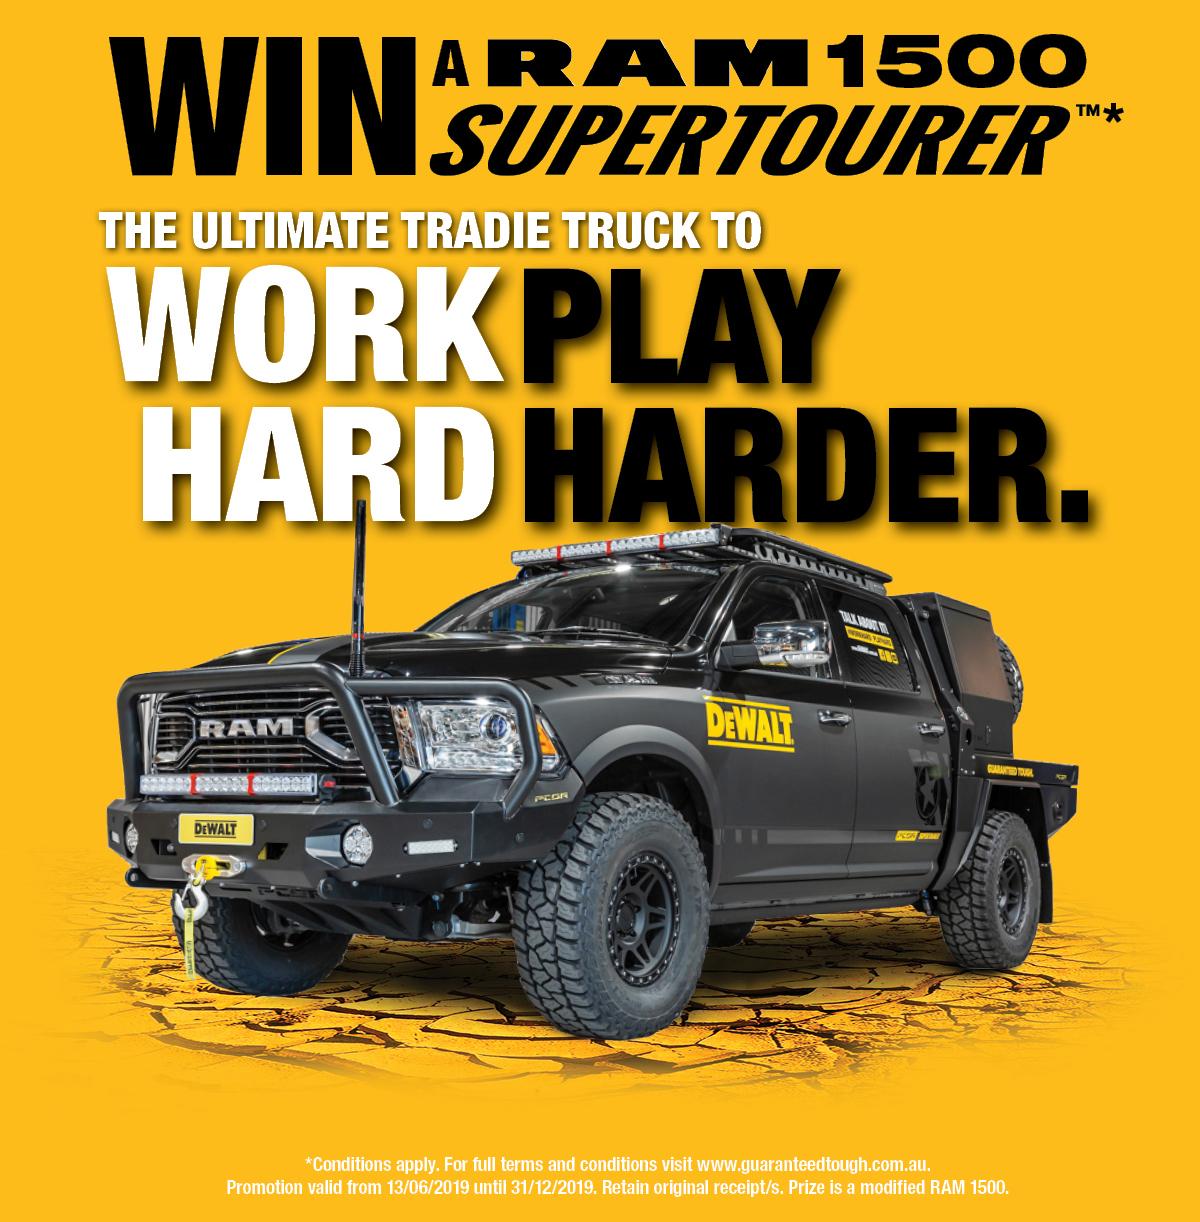 DW207-8_Work Hard Play Hard Social w logo 2.jpg